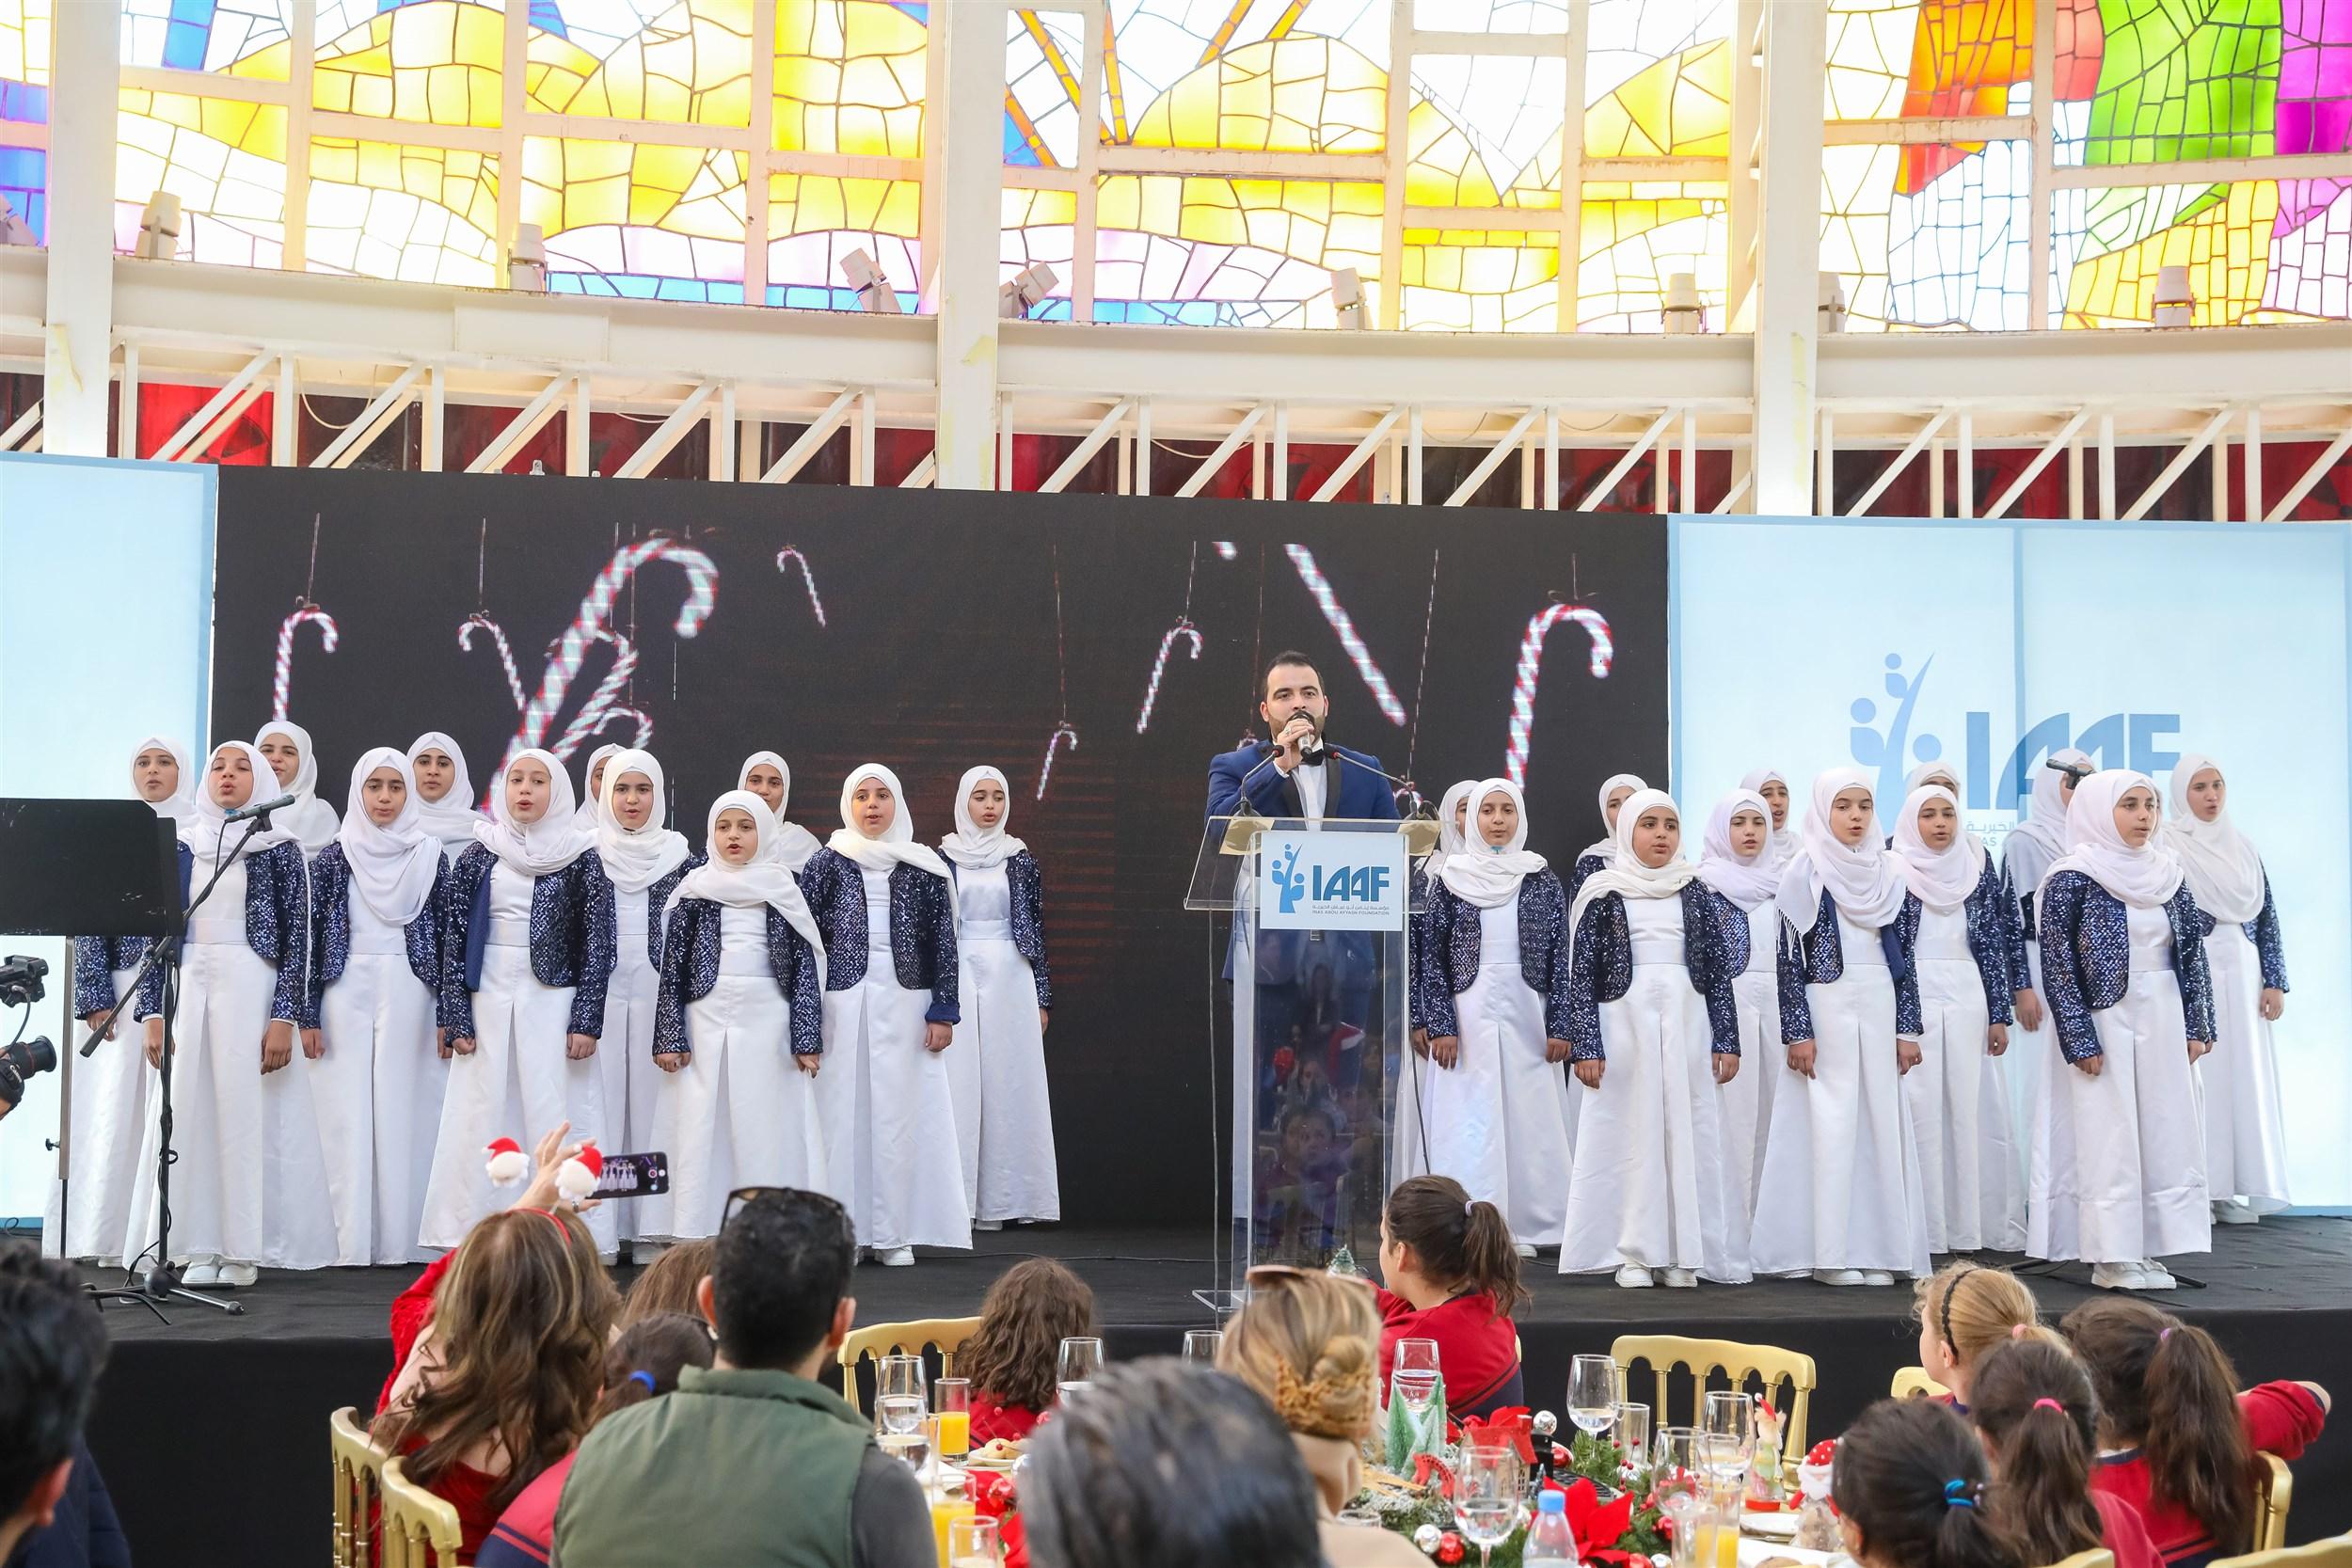 mabarat association singing christmas carols for the first time in bkerke